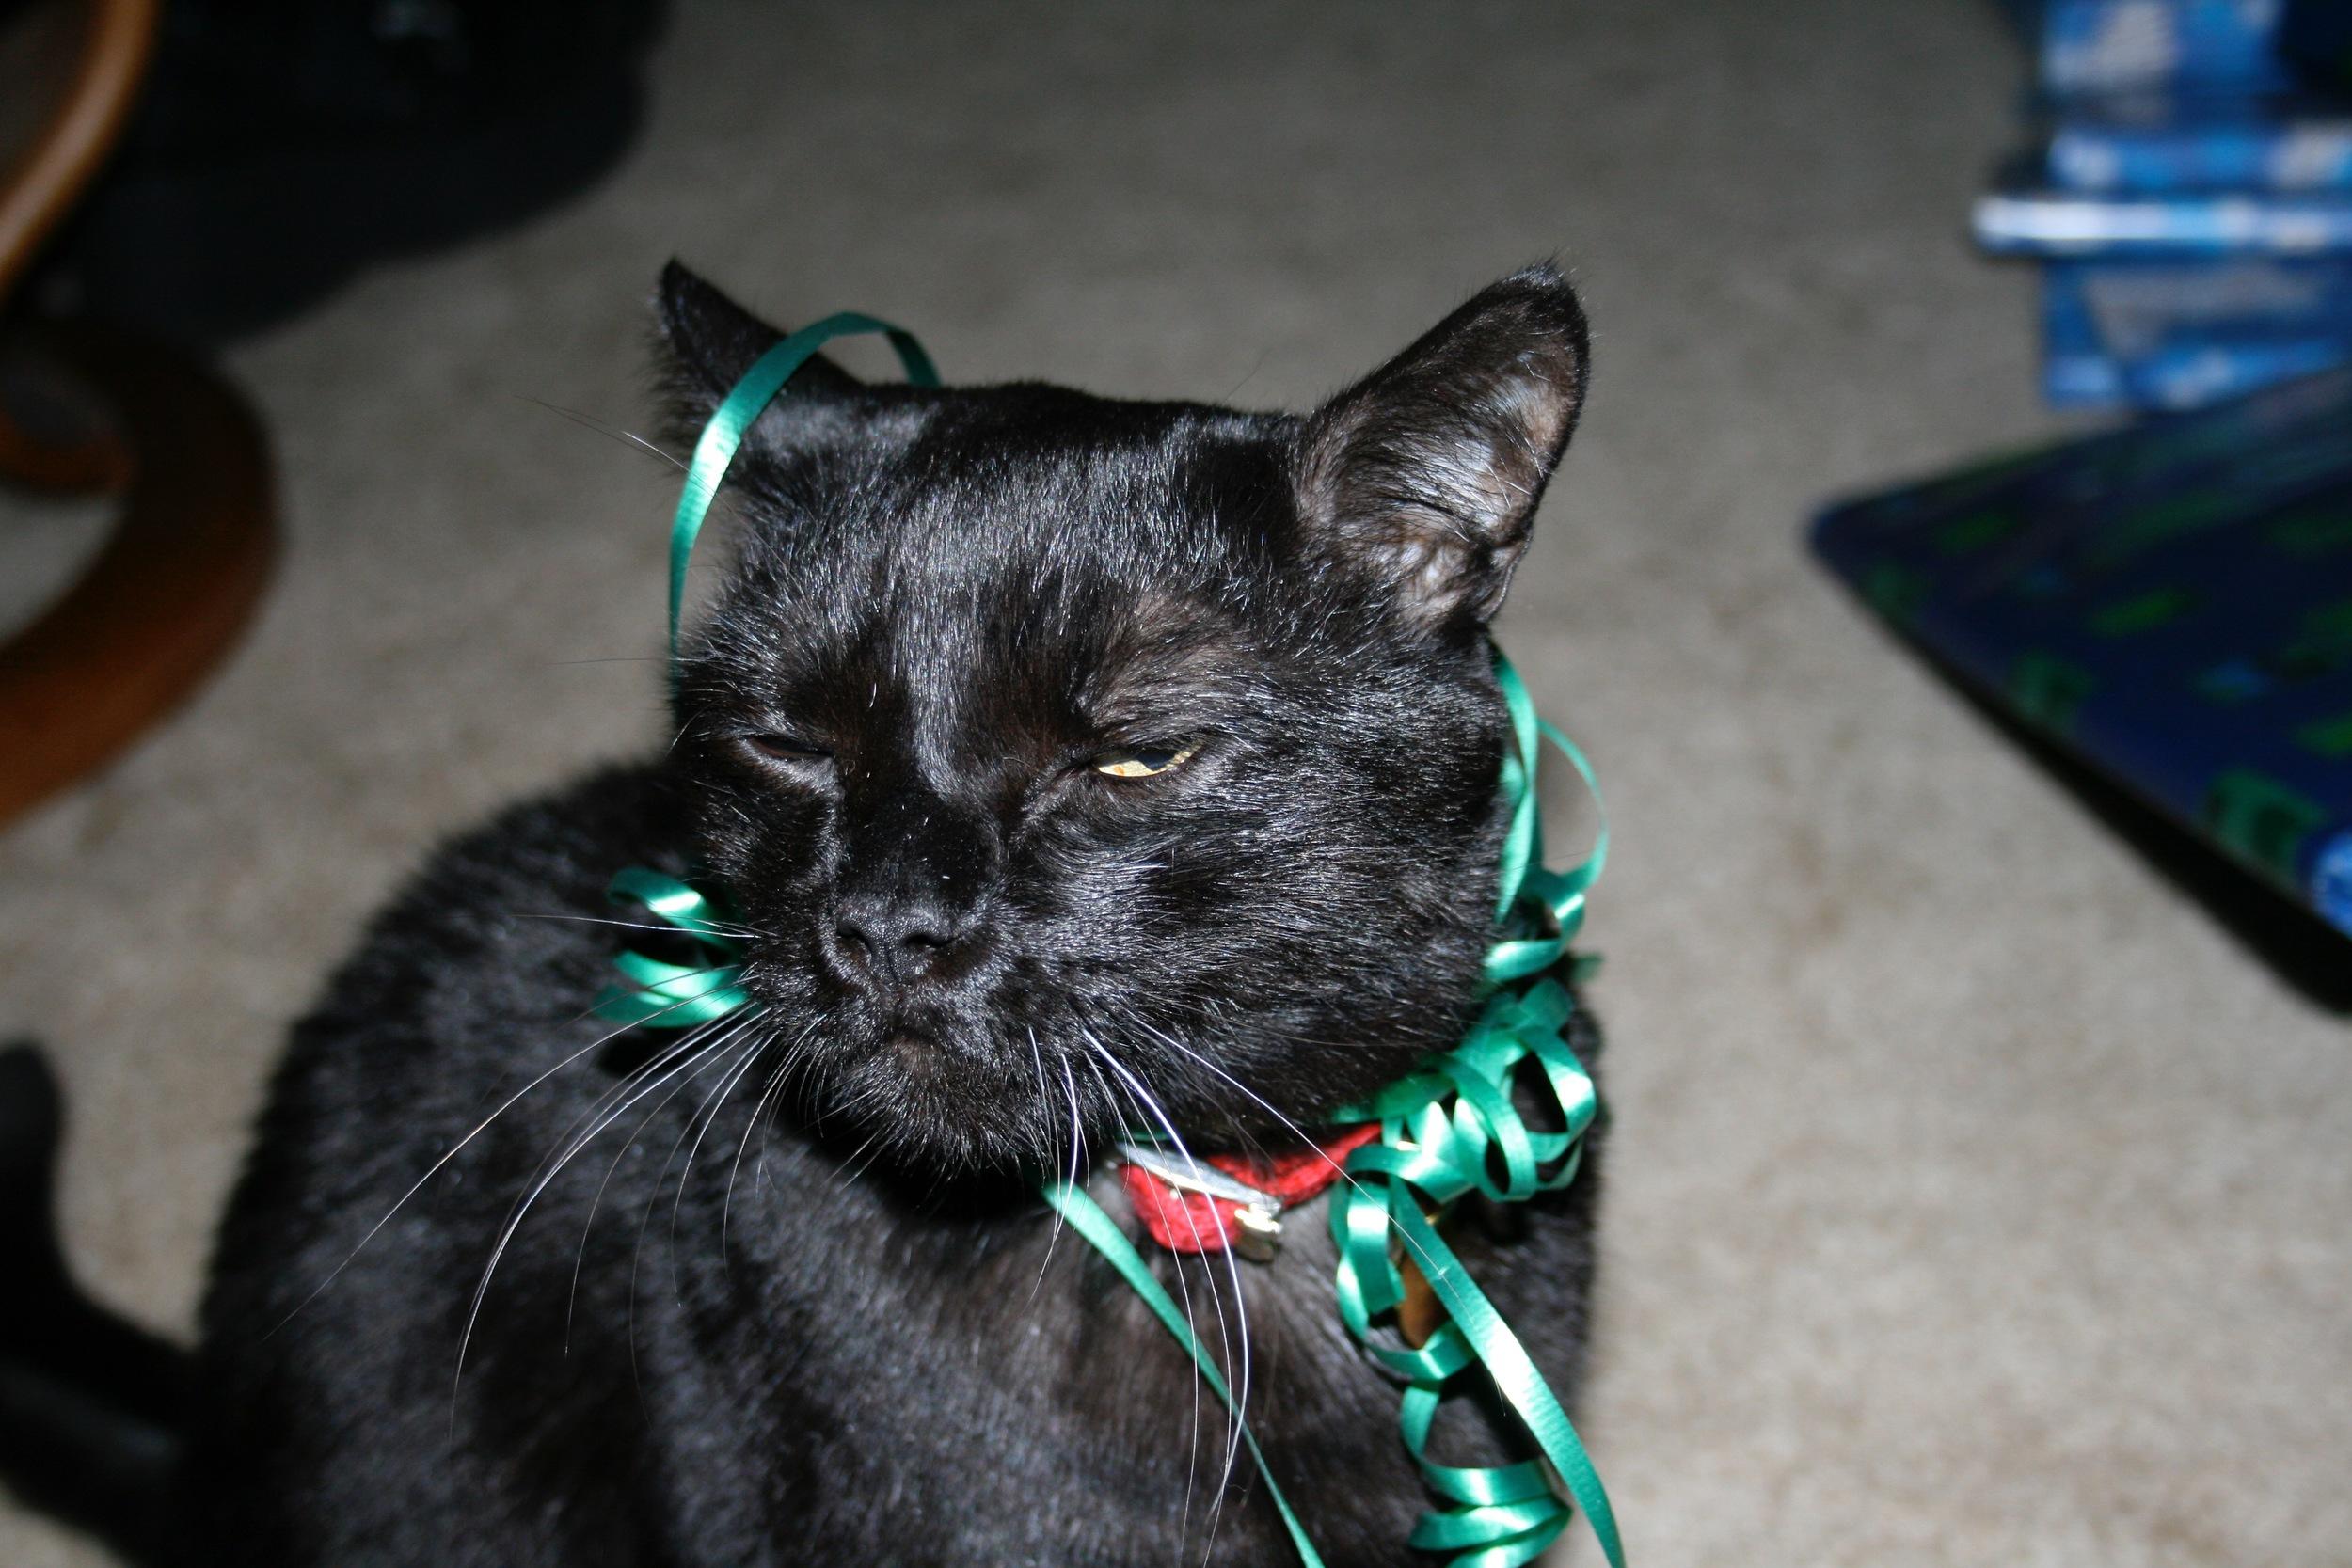 Merry Xmas, Boo.